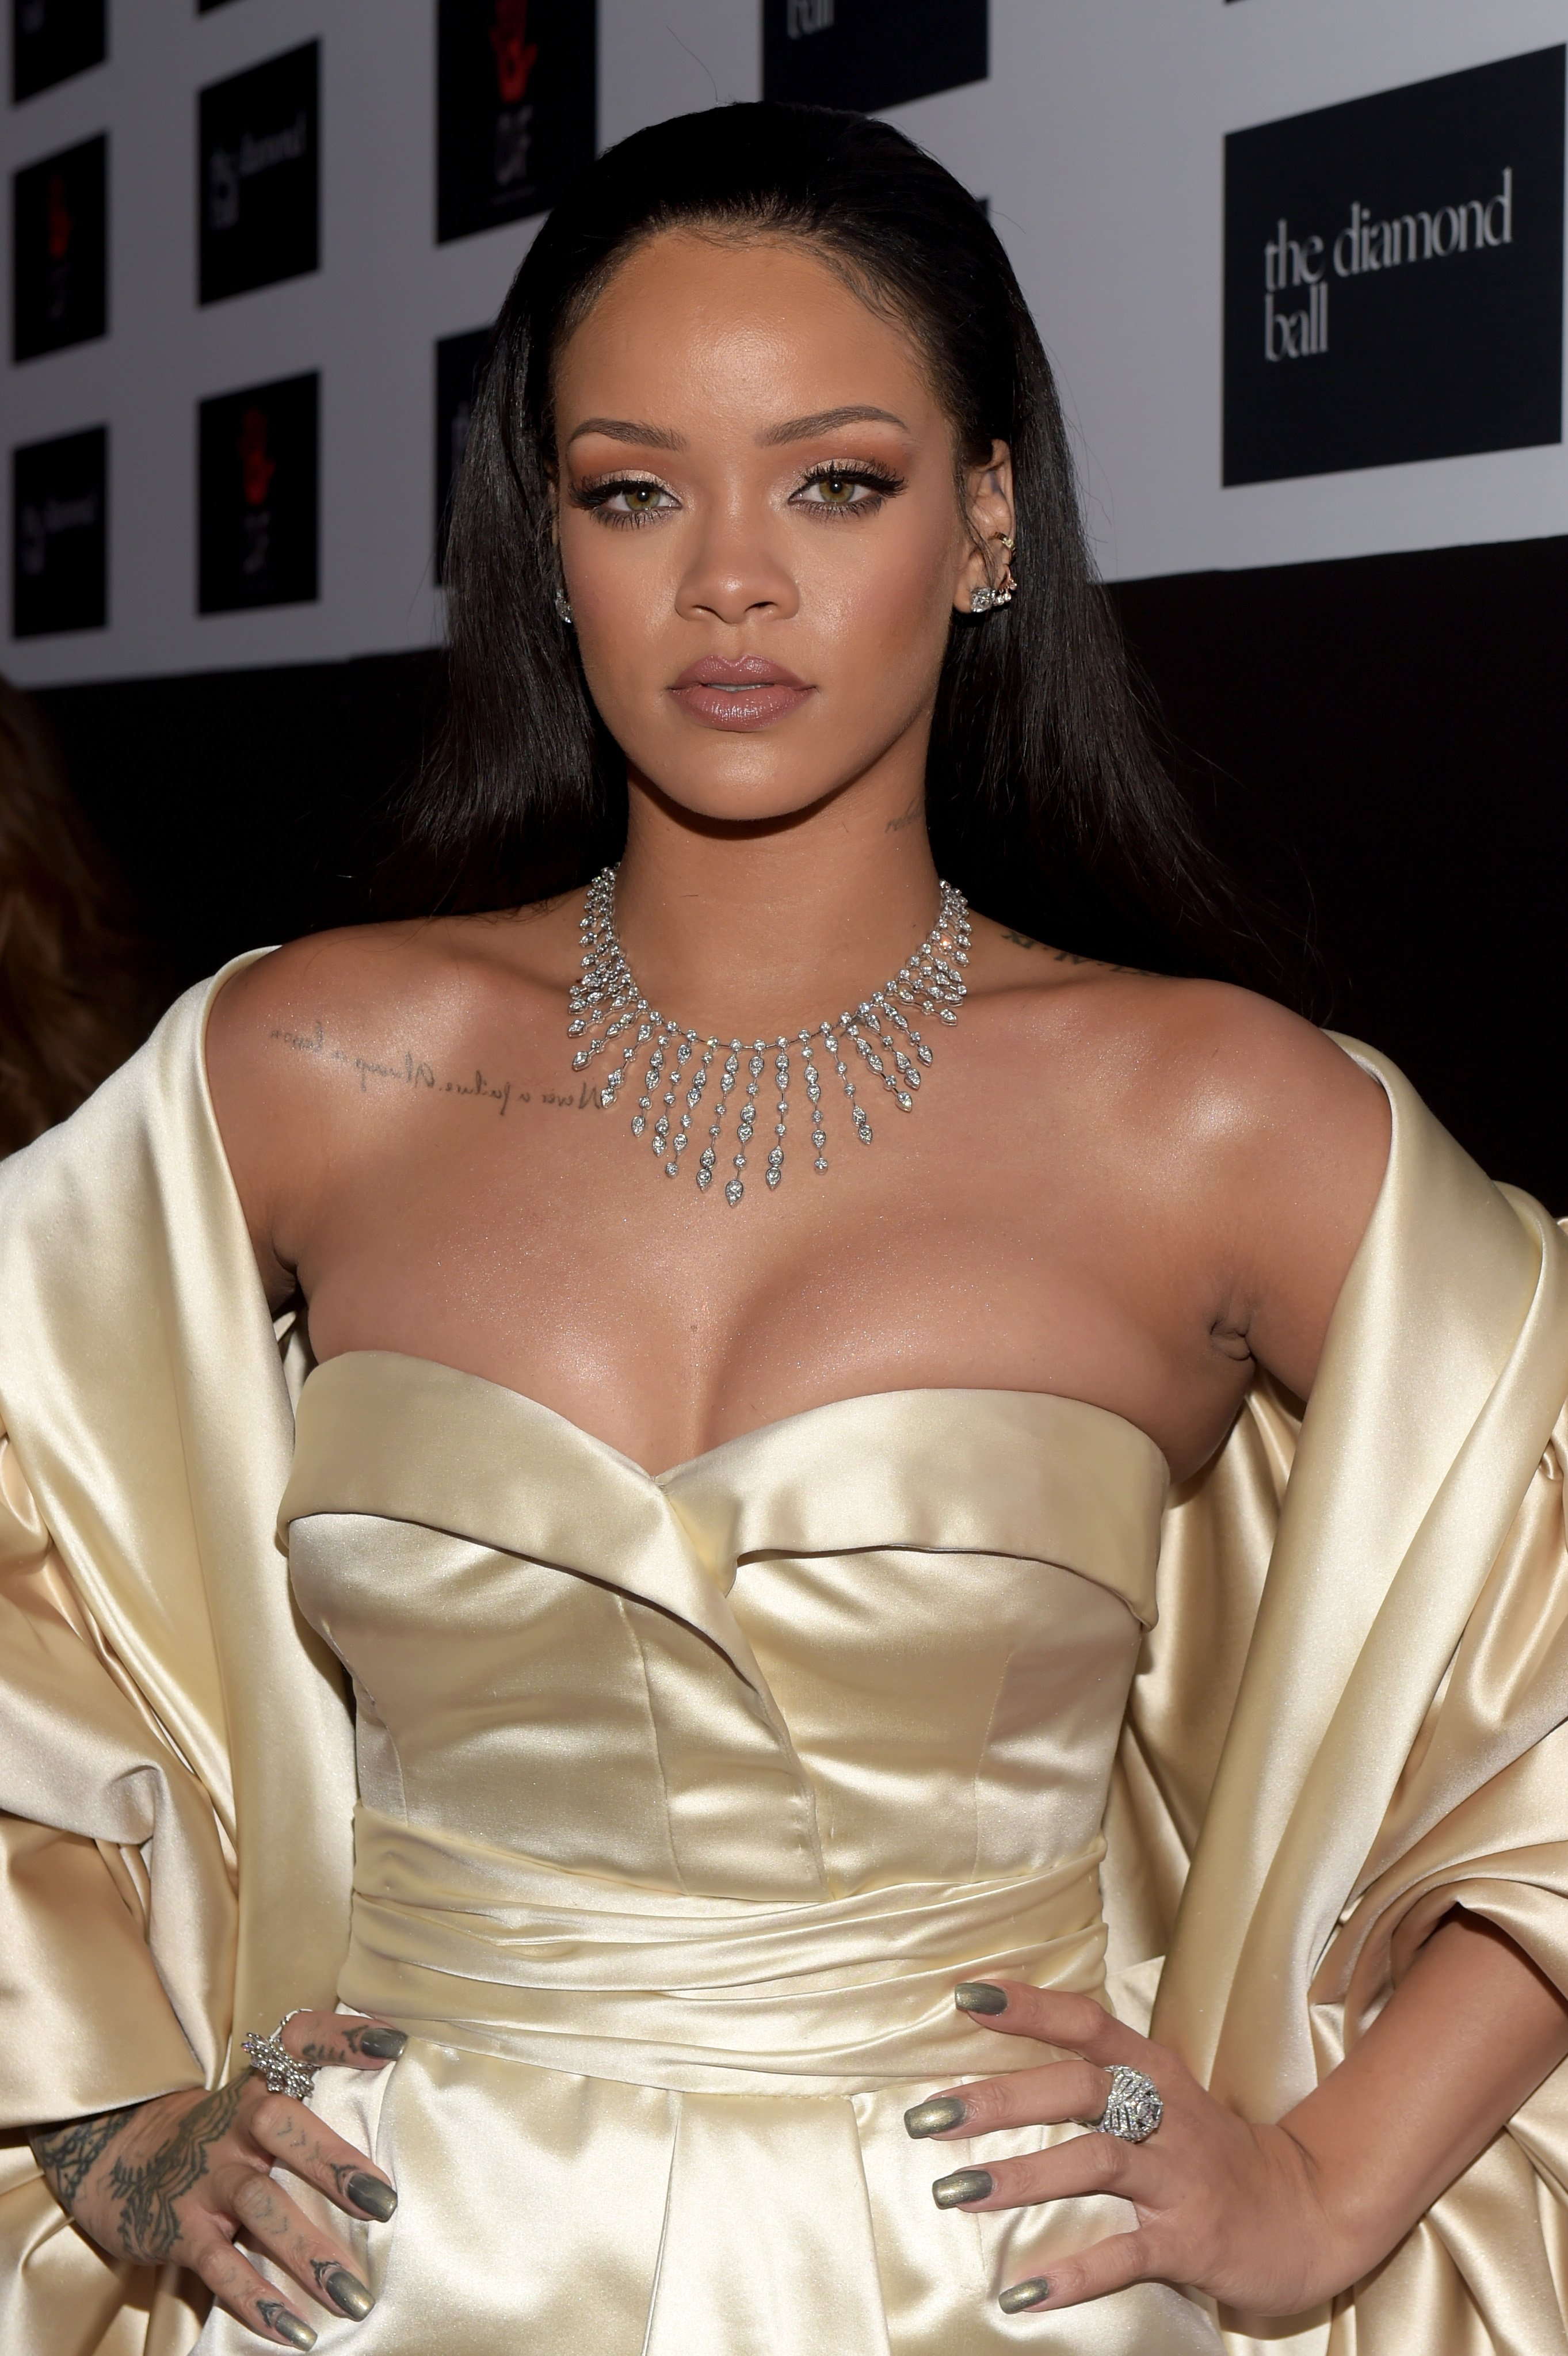 Rihanna at the 2nd Annual Diamond Ball on Dec. 10, 2015 in Santa Monica, California. |Photo: Getty Images